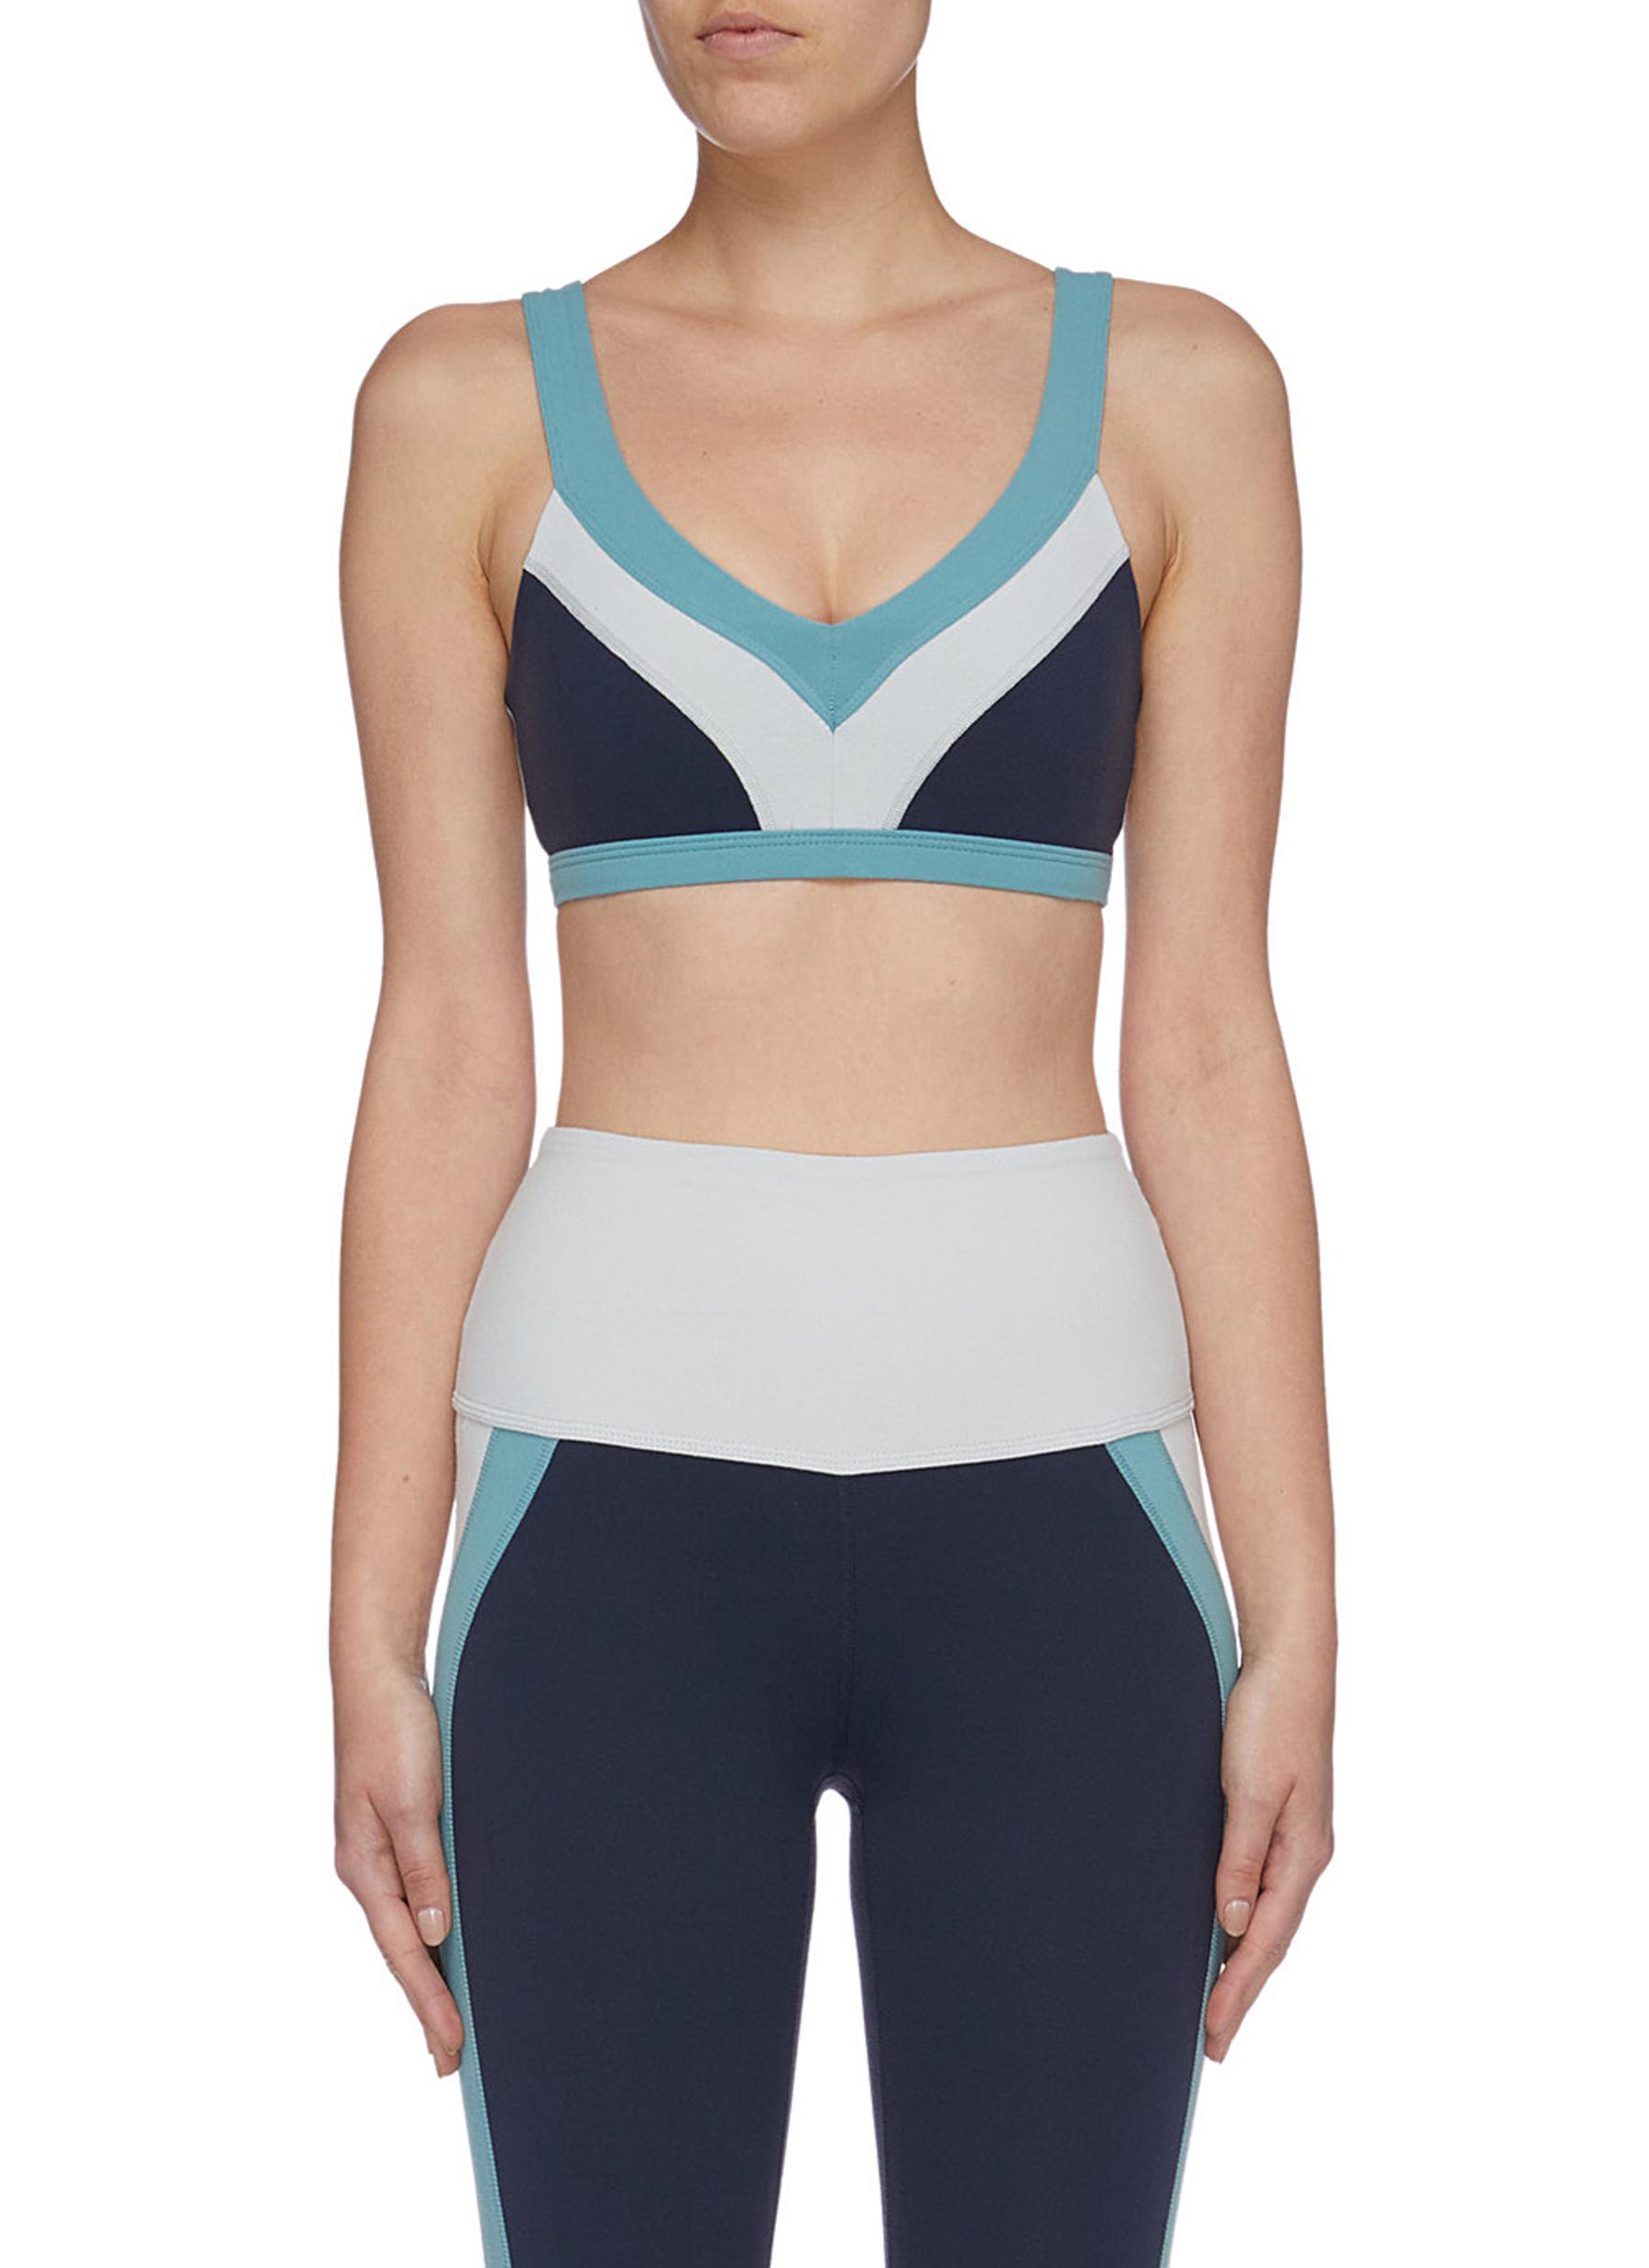 True colourblock sports bra by Beyond Yoga